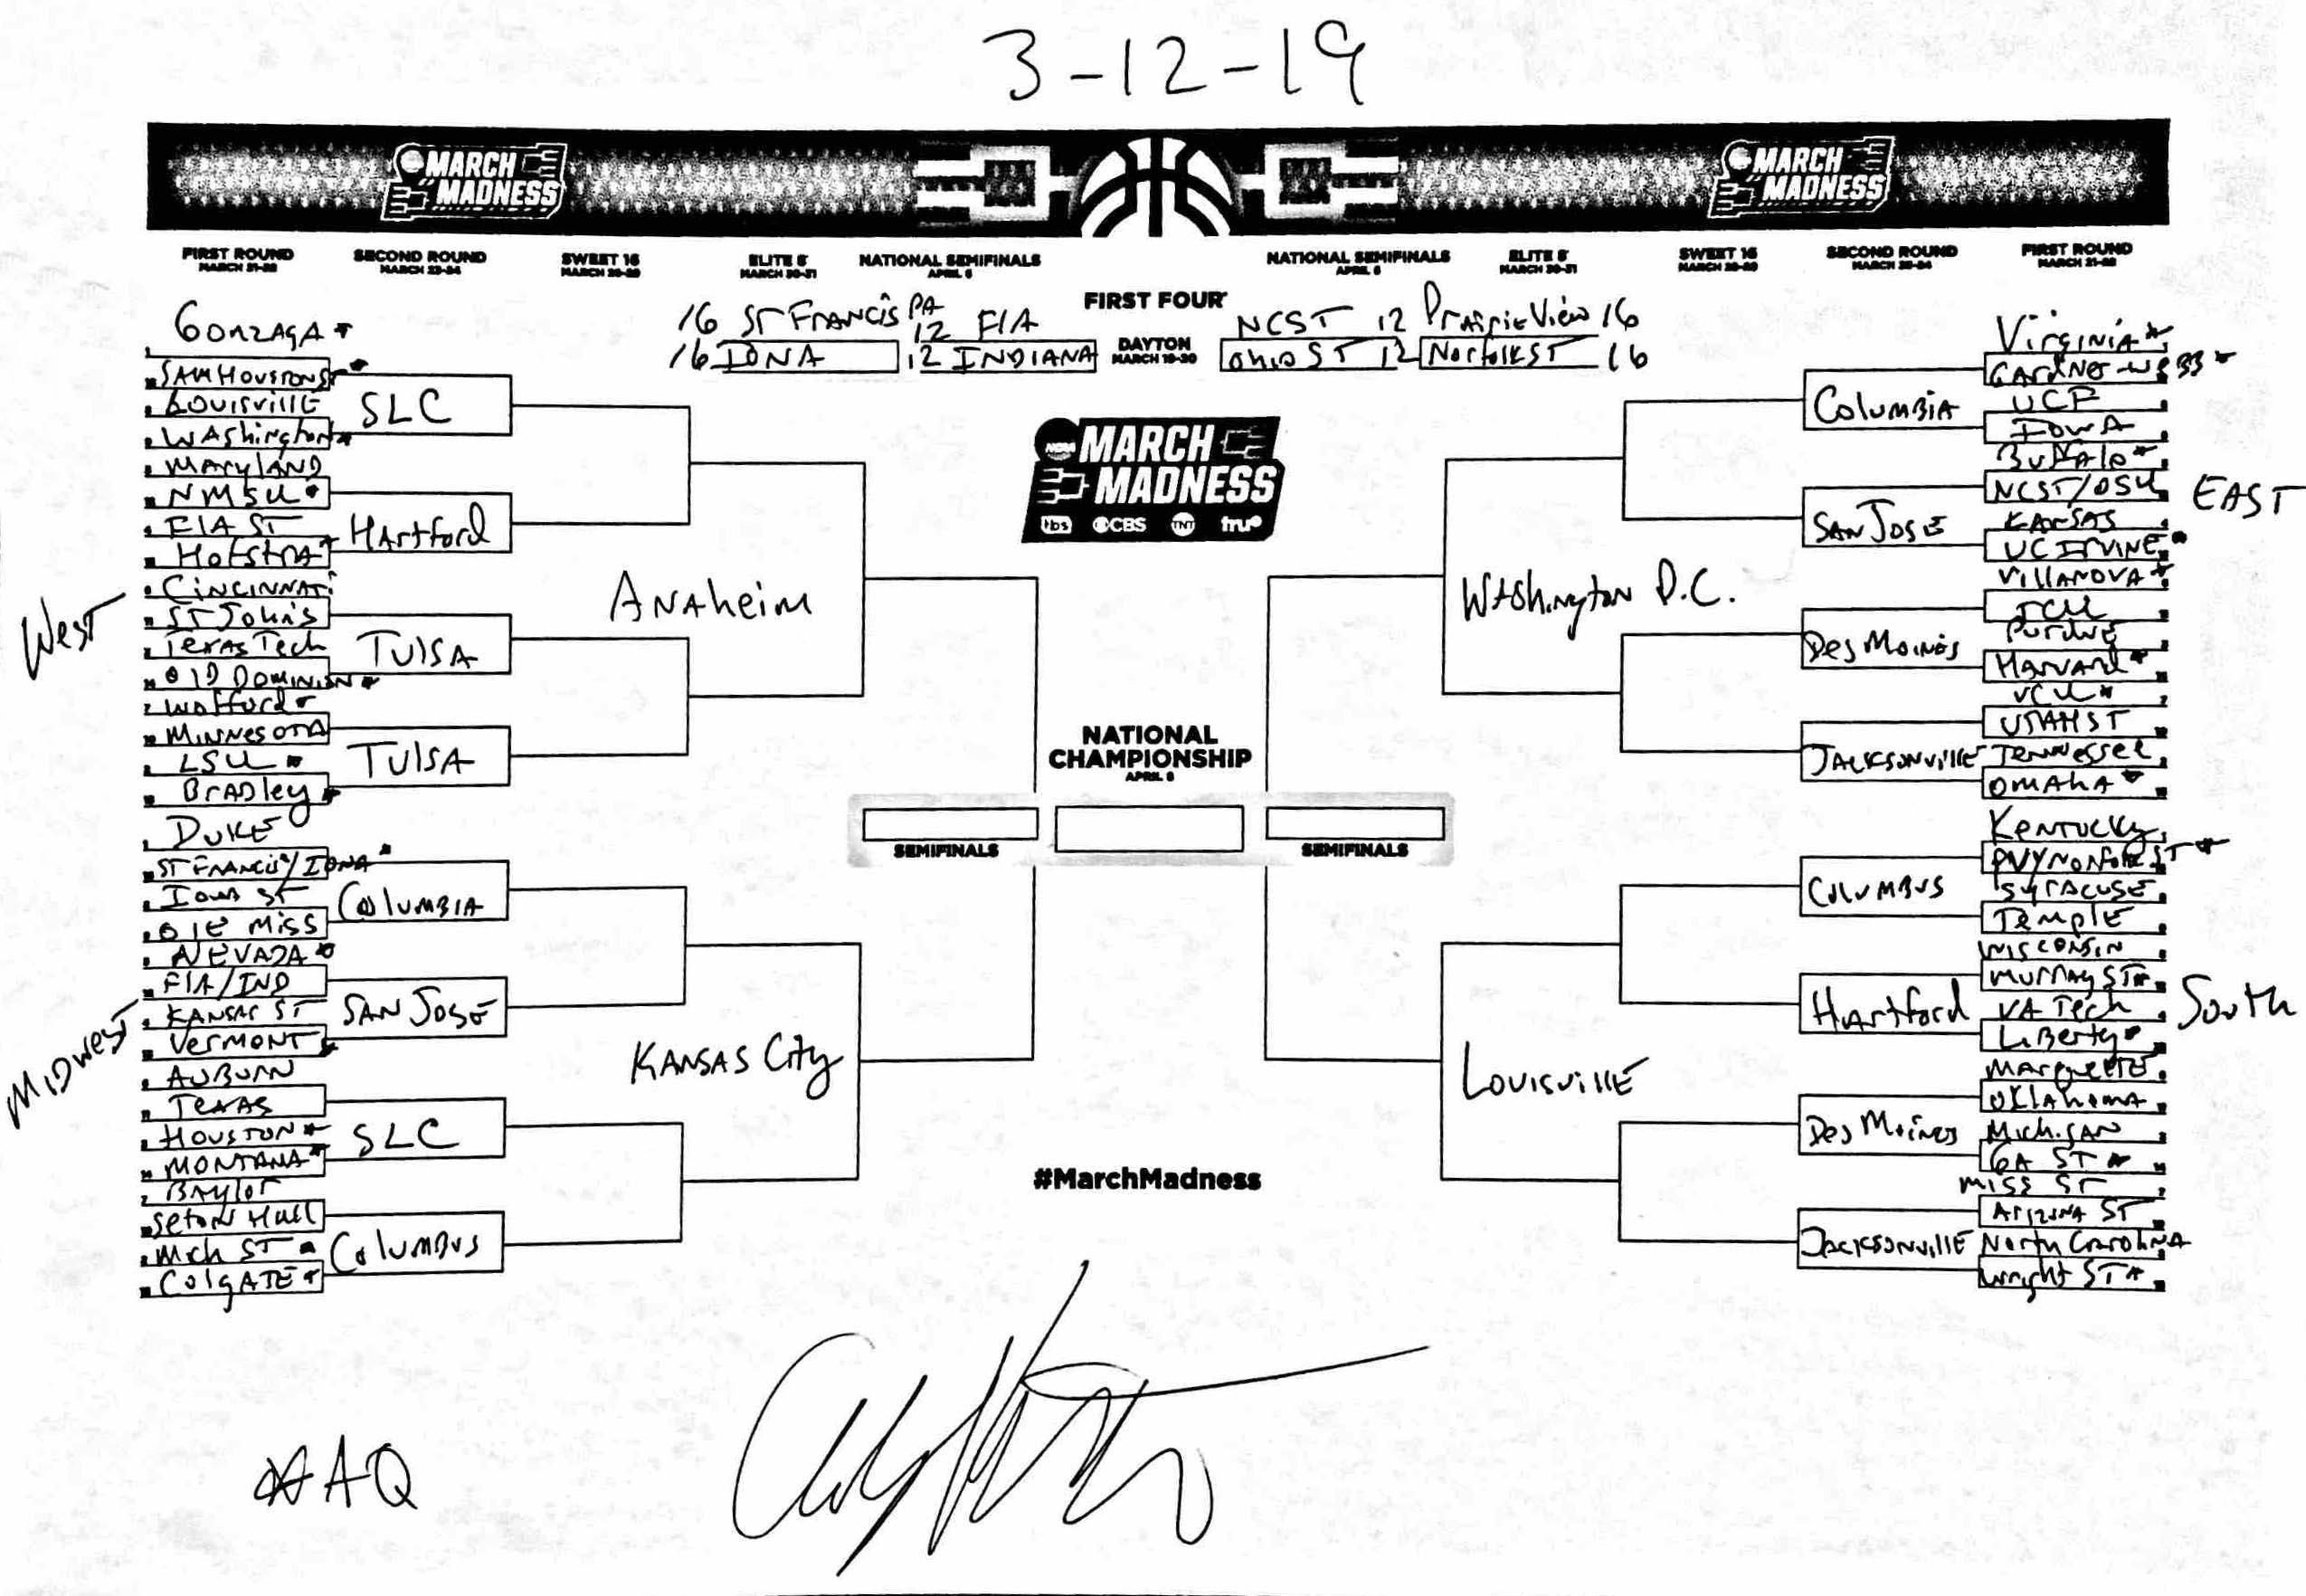 Andy Katz's NCAA tournament bracket prediction March 12